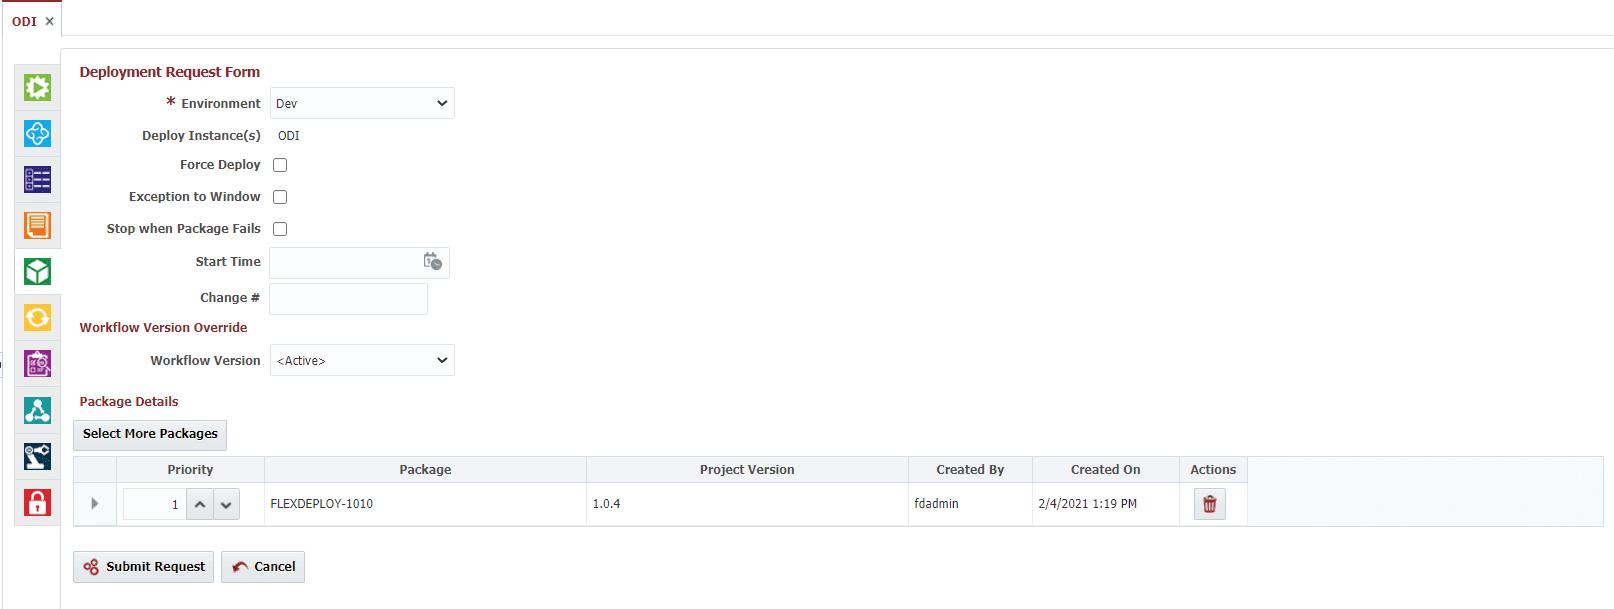 ODI Deployment Request Form in FlexDeploy